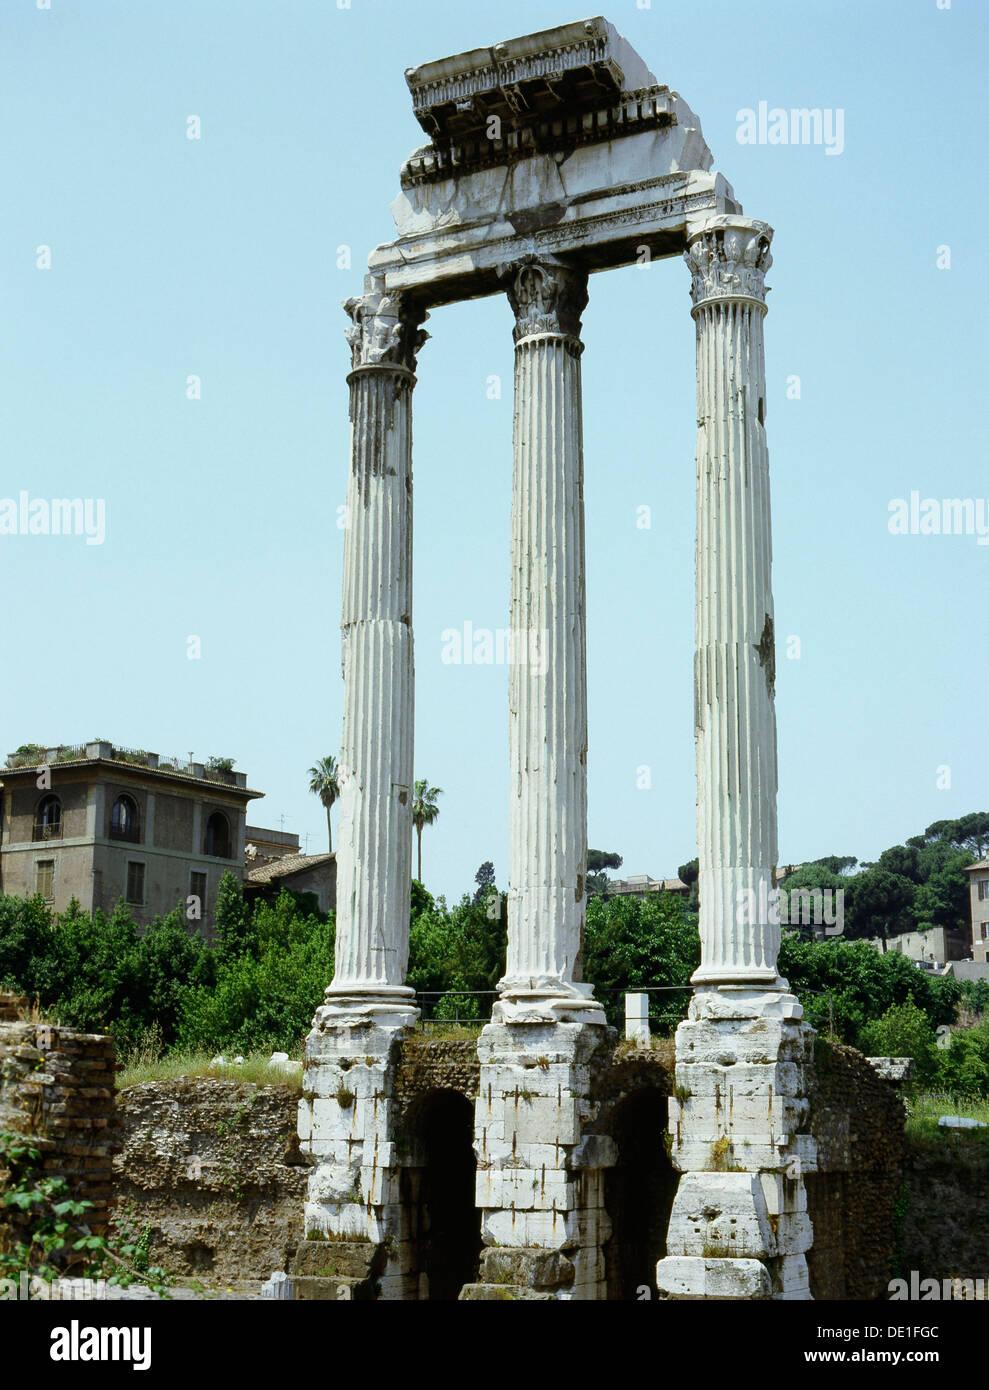 The Roman Forum. - Stock Image